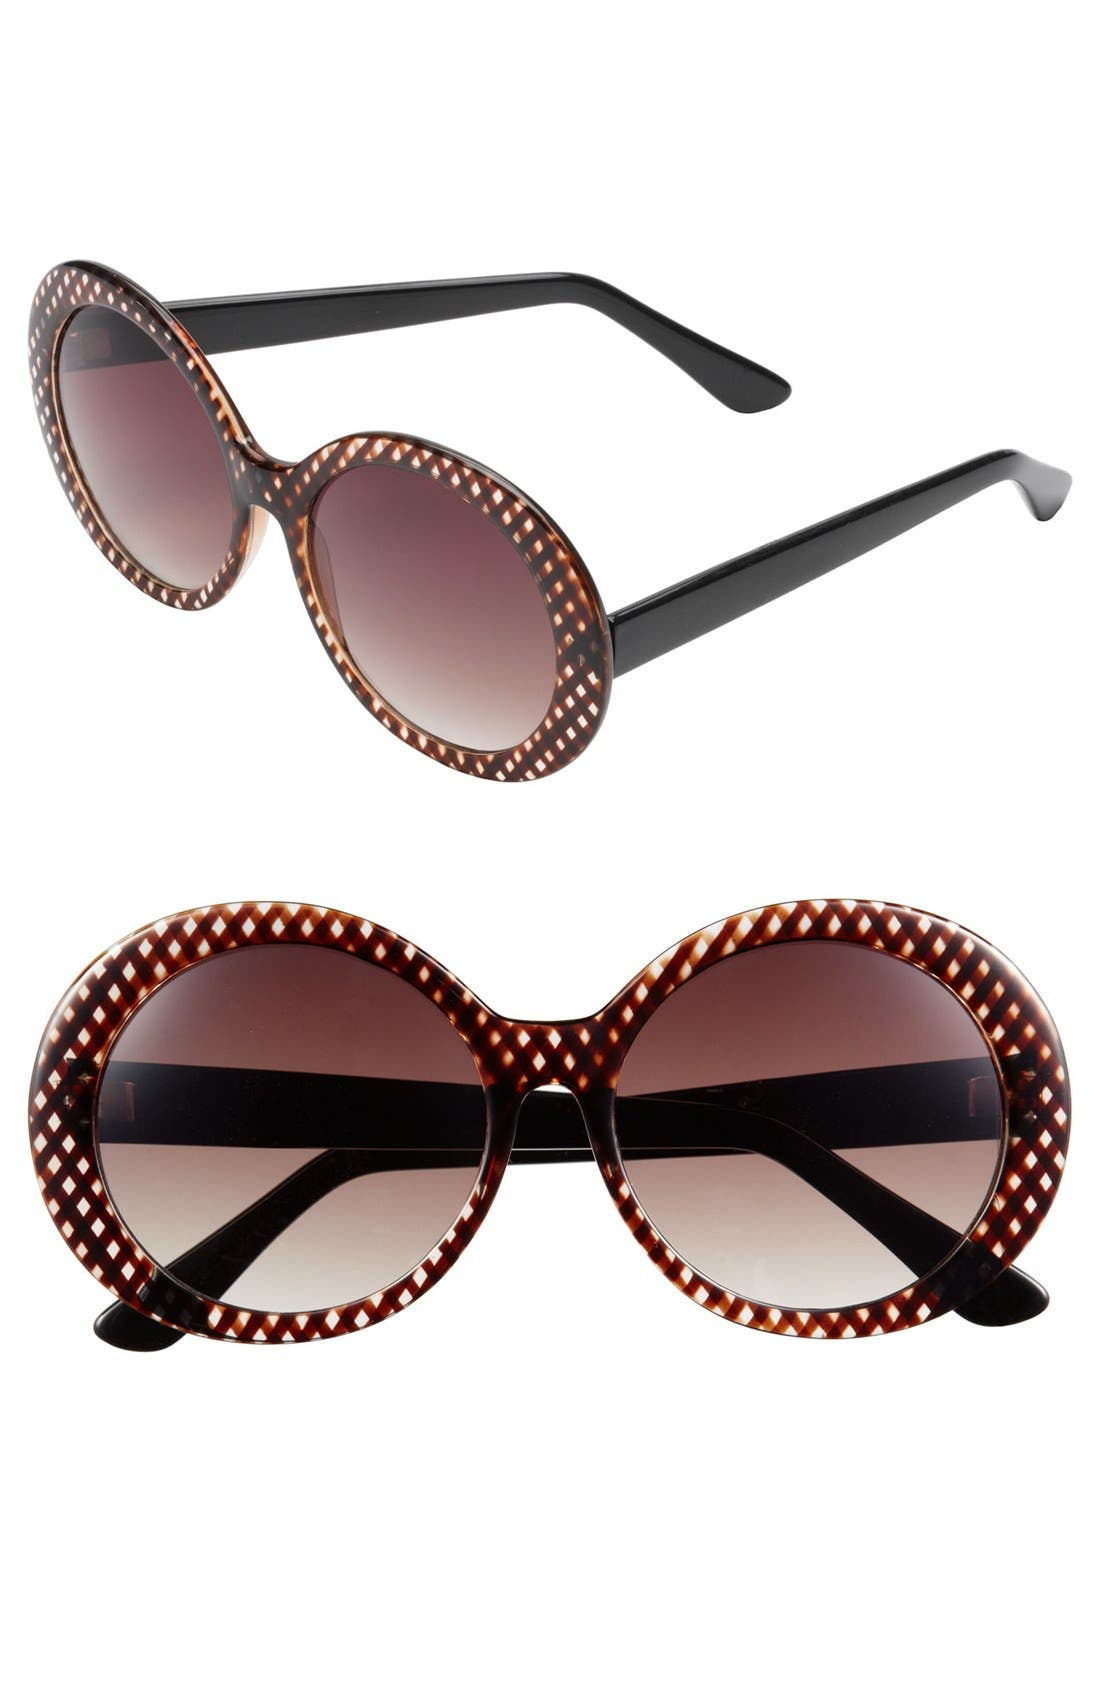 Main Image - Outlook Eyewear 'La Jolla' Sunglasses